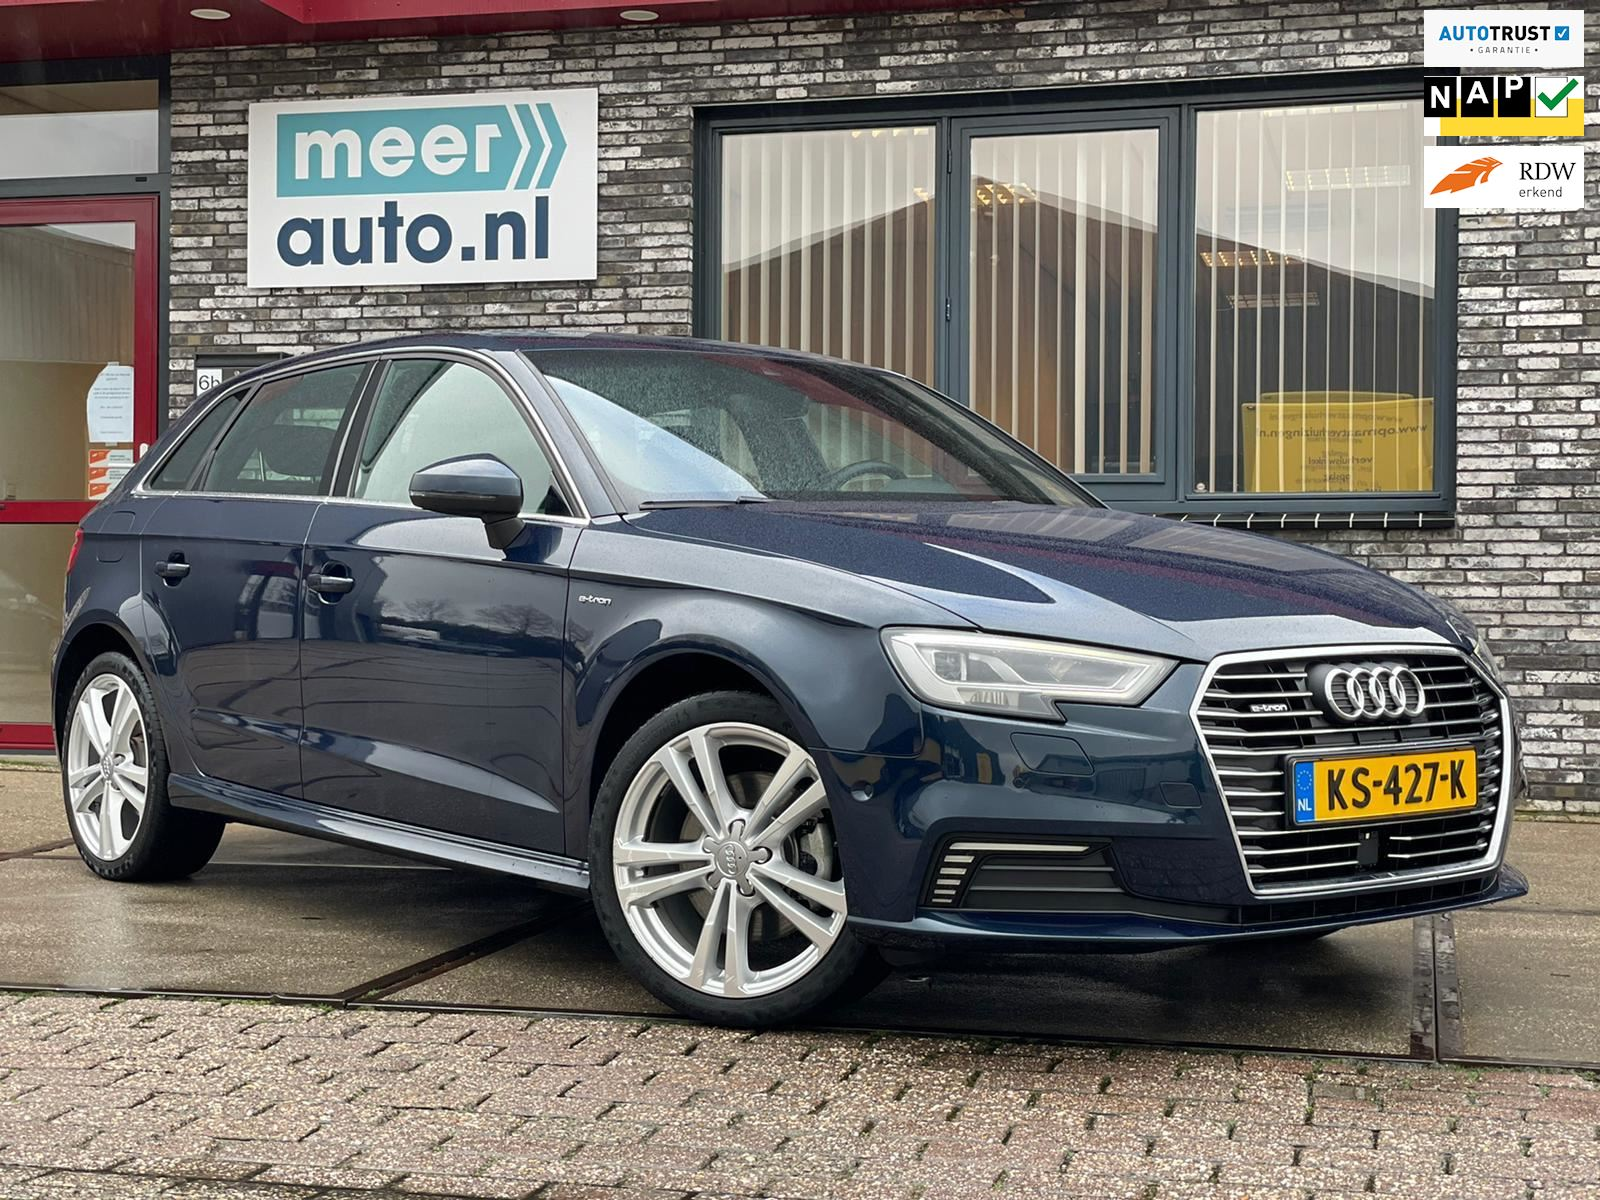 Audi A3 Sportback occasion - Meerauto.nl